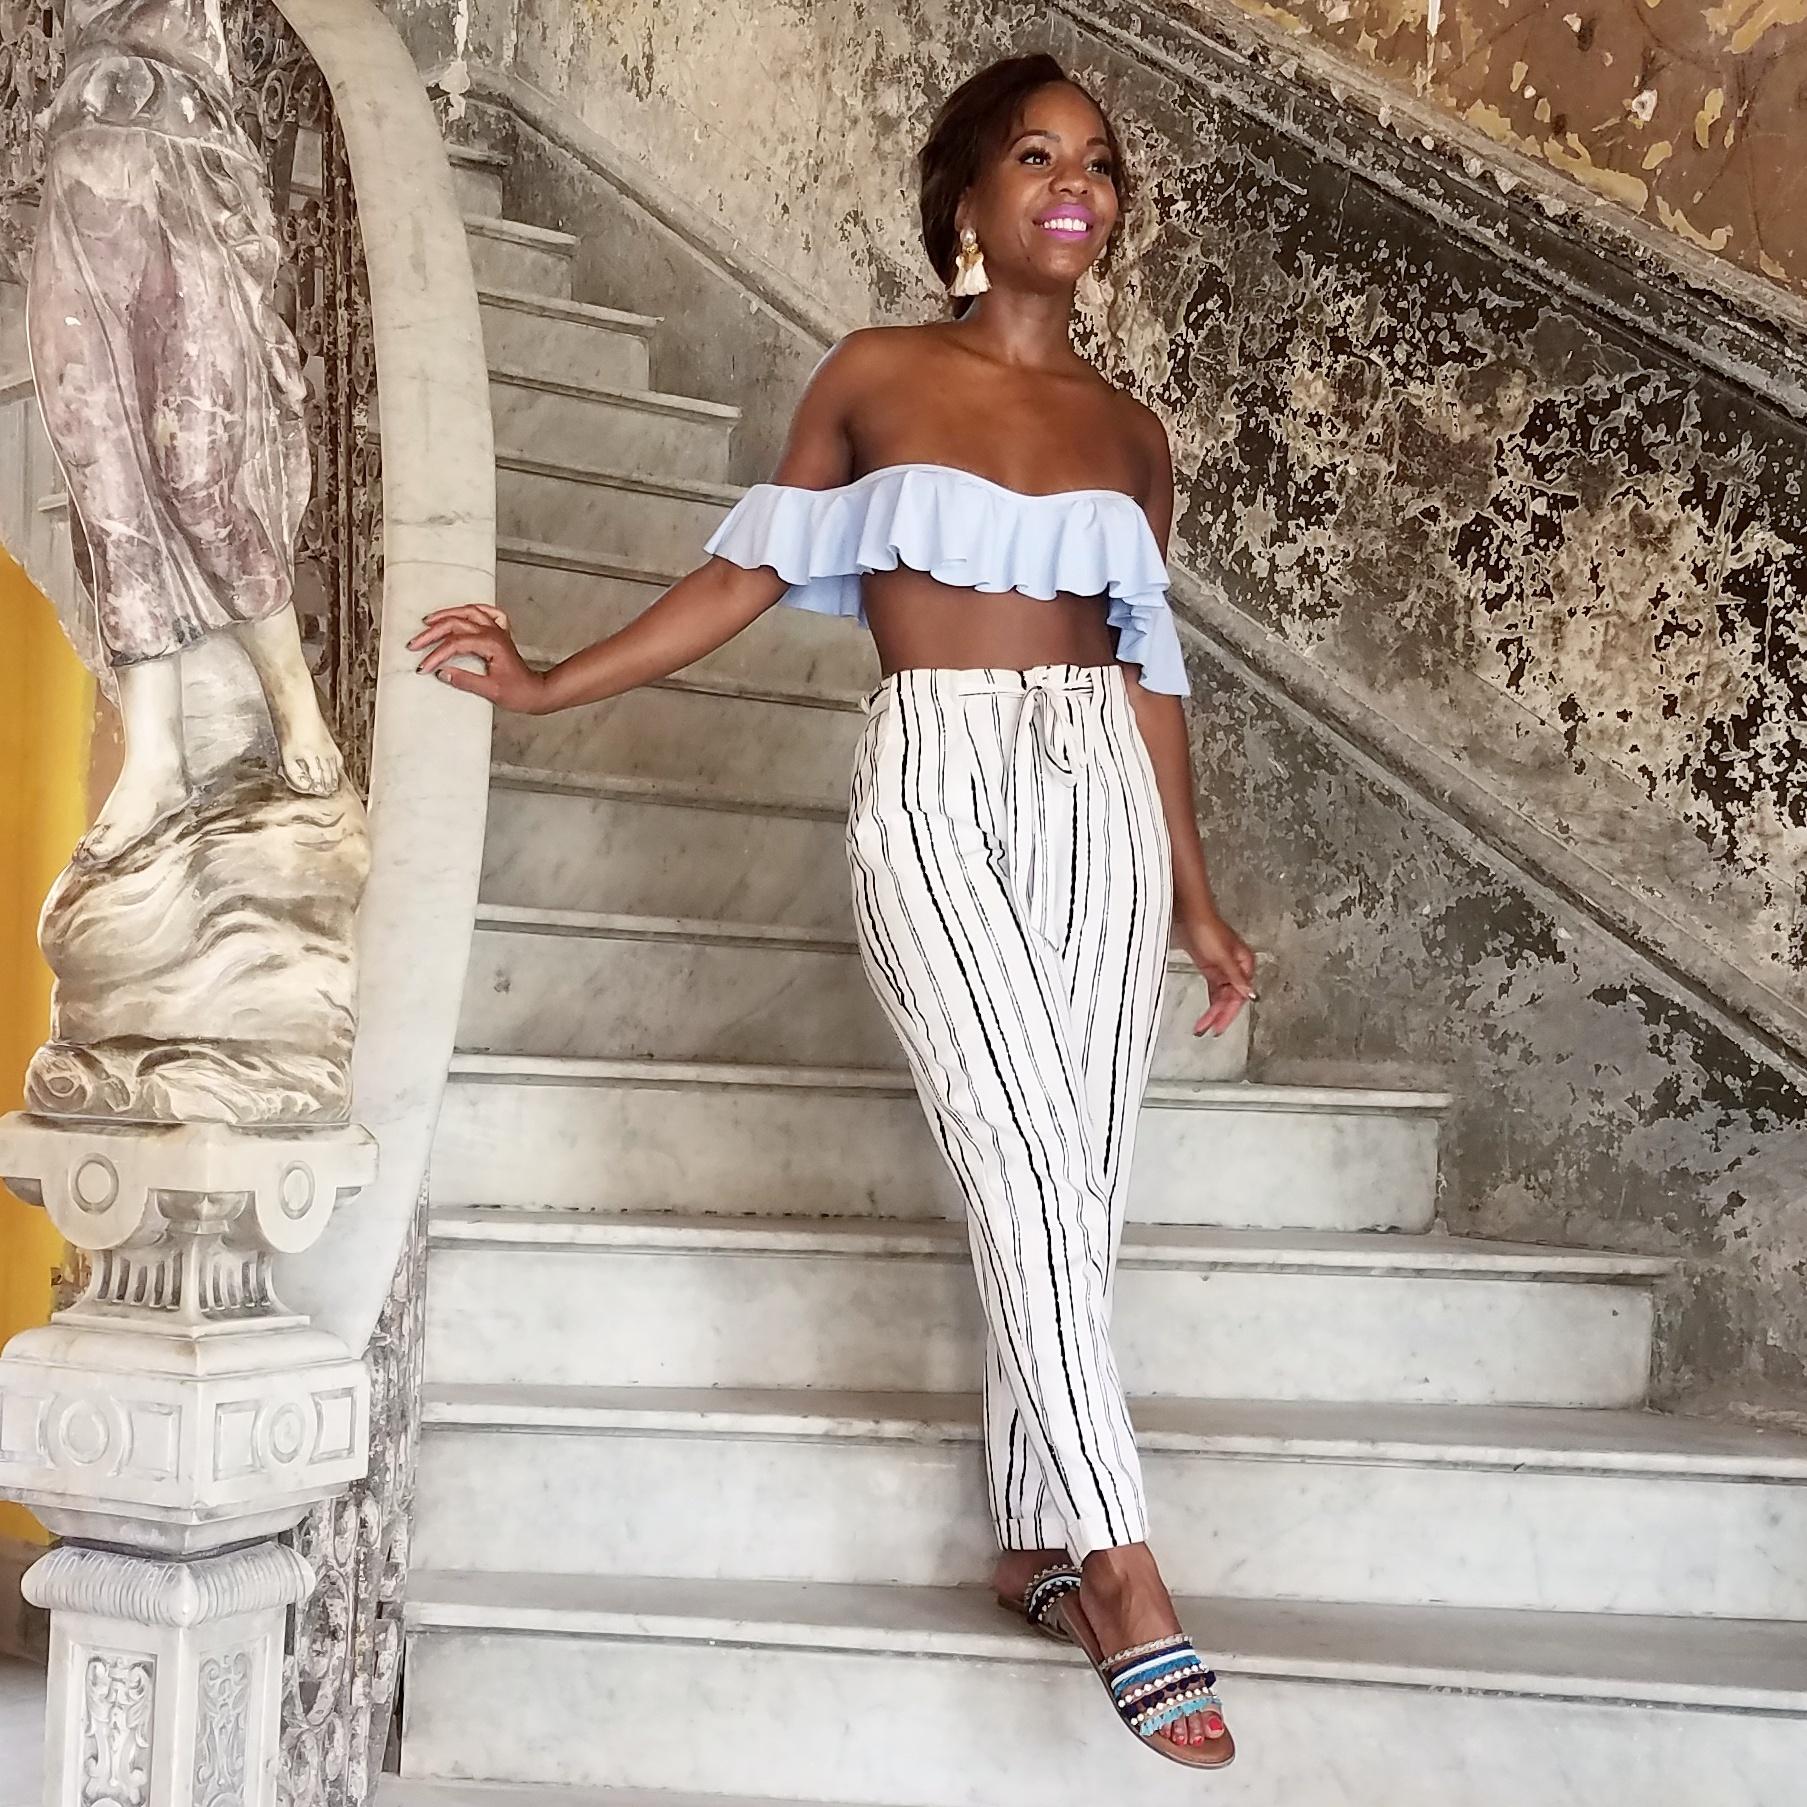 La Guarida Cuba Havan Stairs